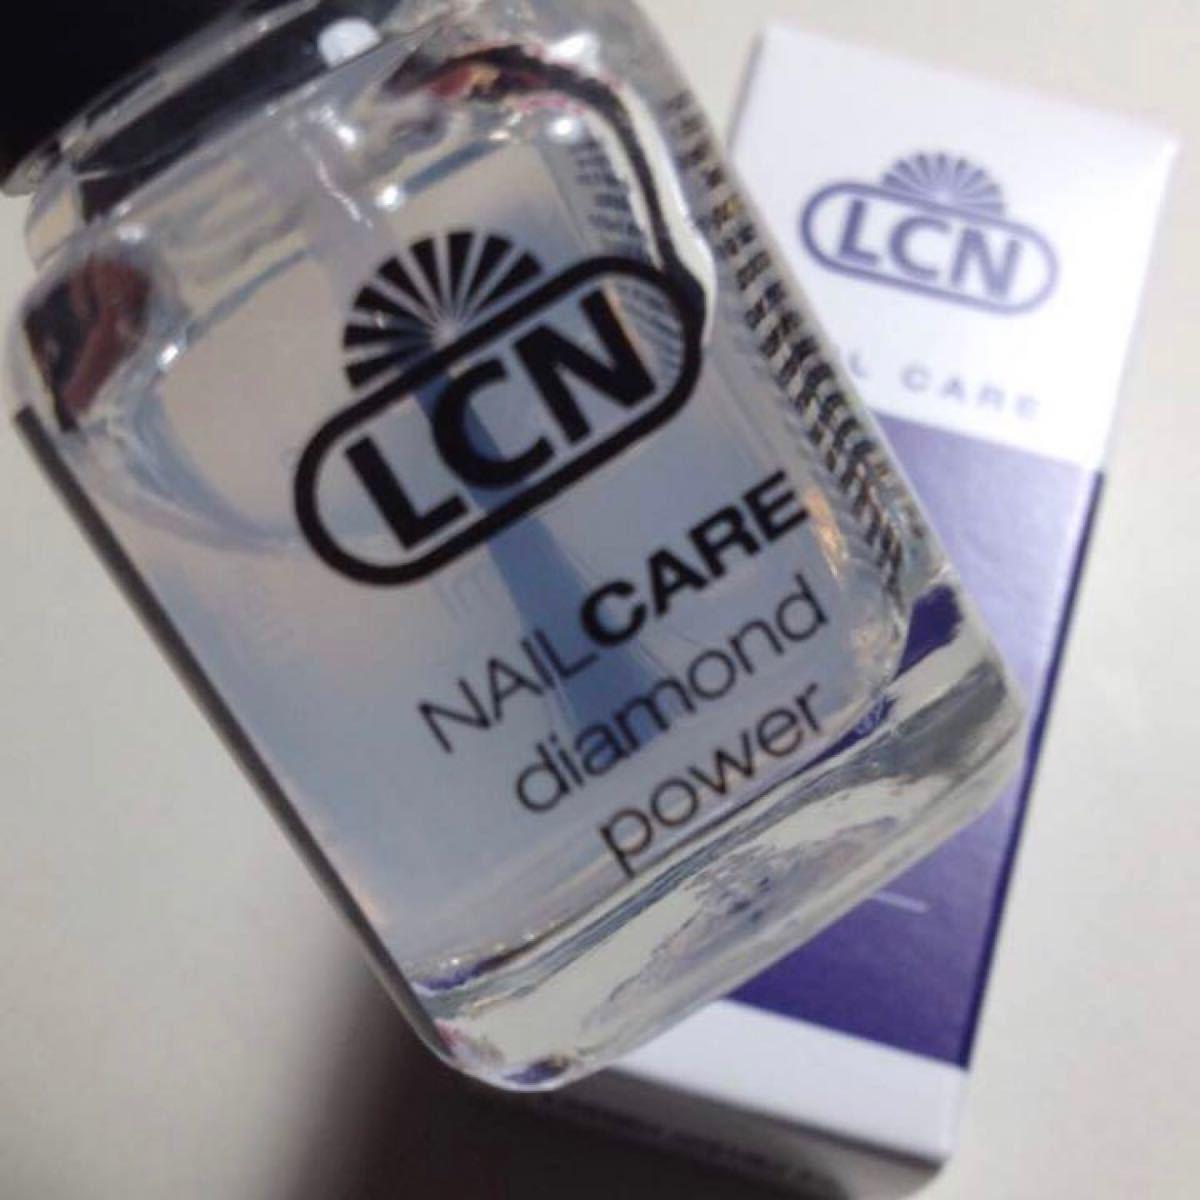 LCNダイヤモンドパワー・新品未使用未開封・ベース&トップコート兼用のコート材